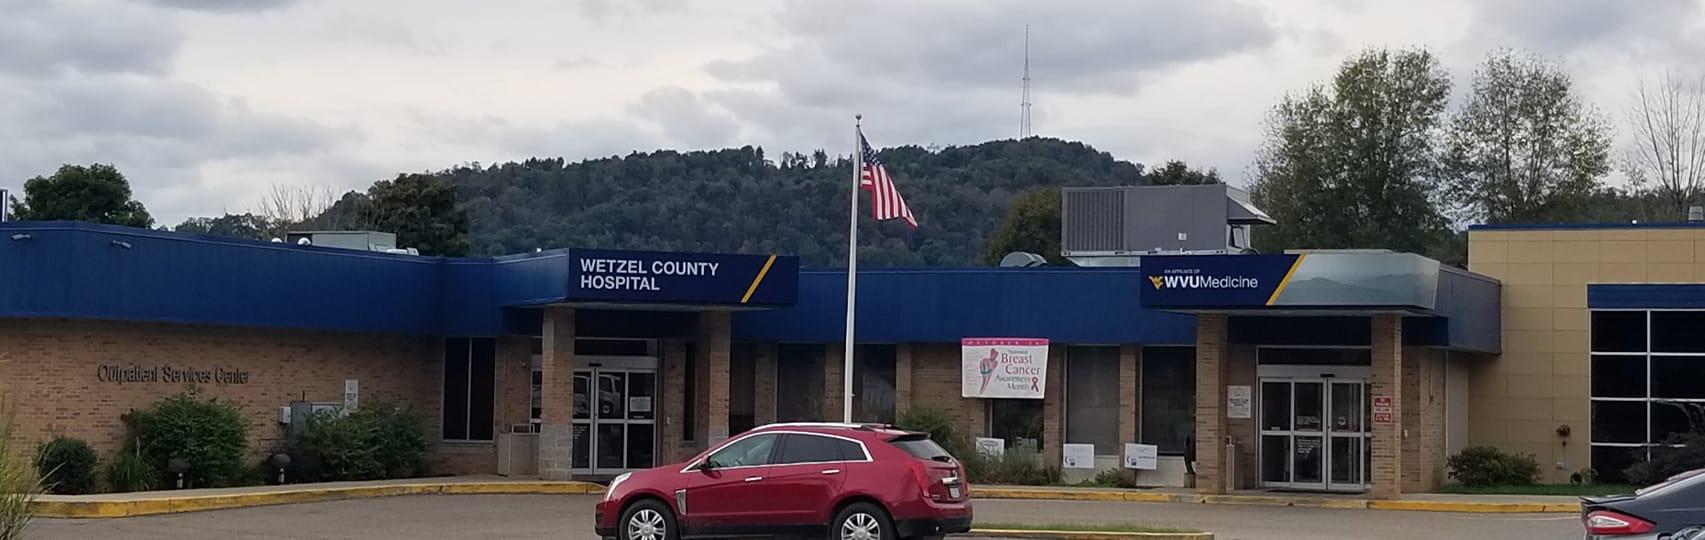 Wetzel County Hospital